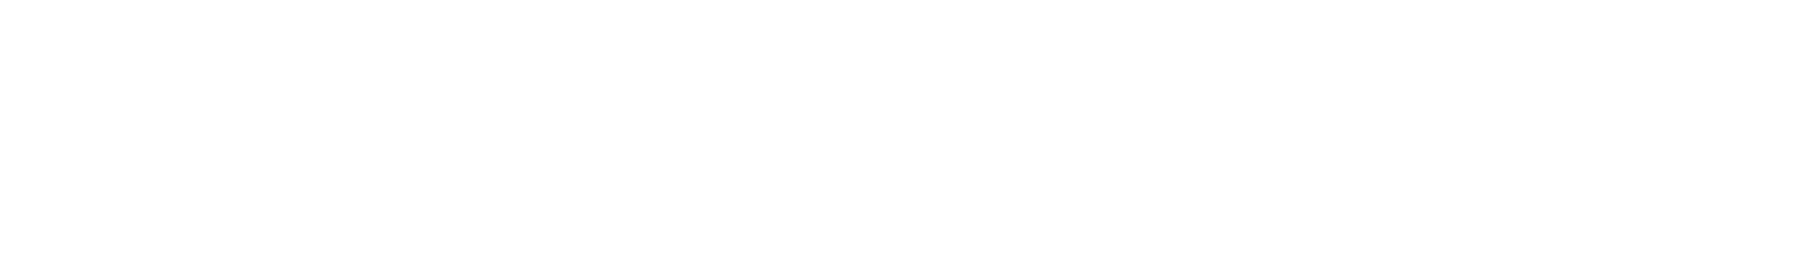 vedh melodyloop 017 cm a g 122bpm